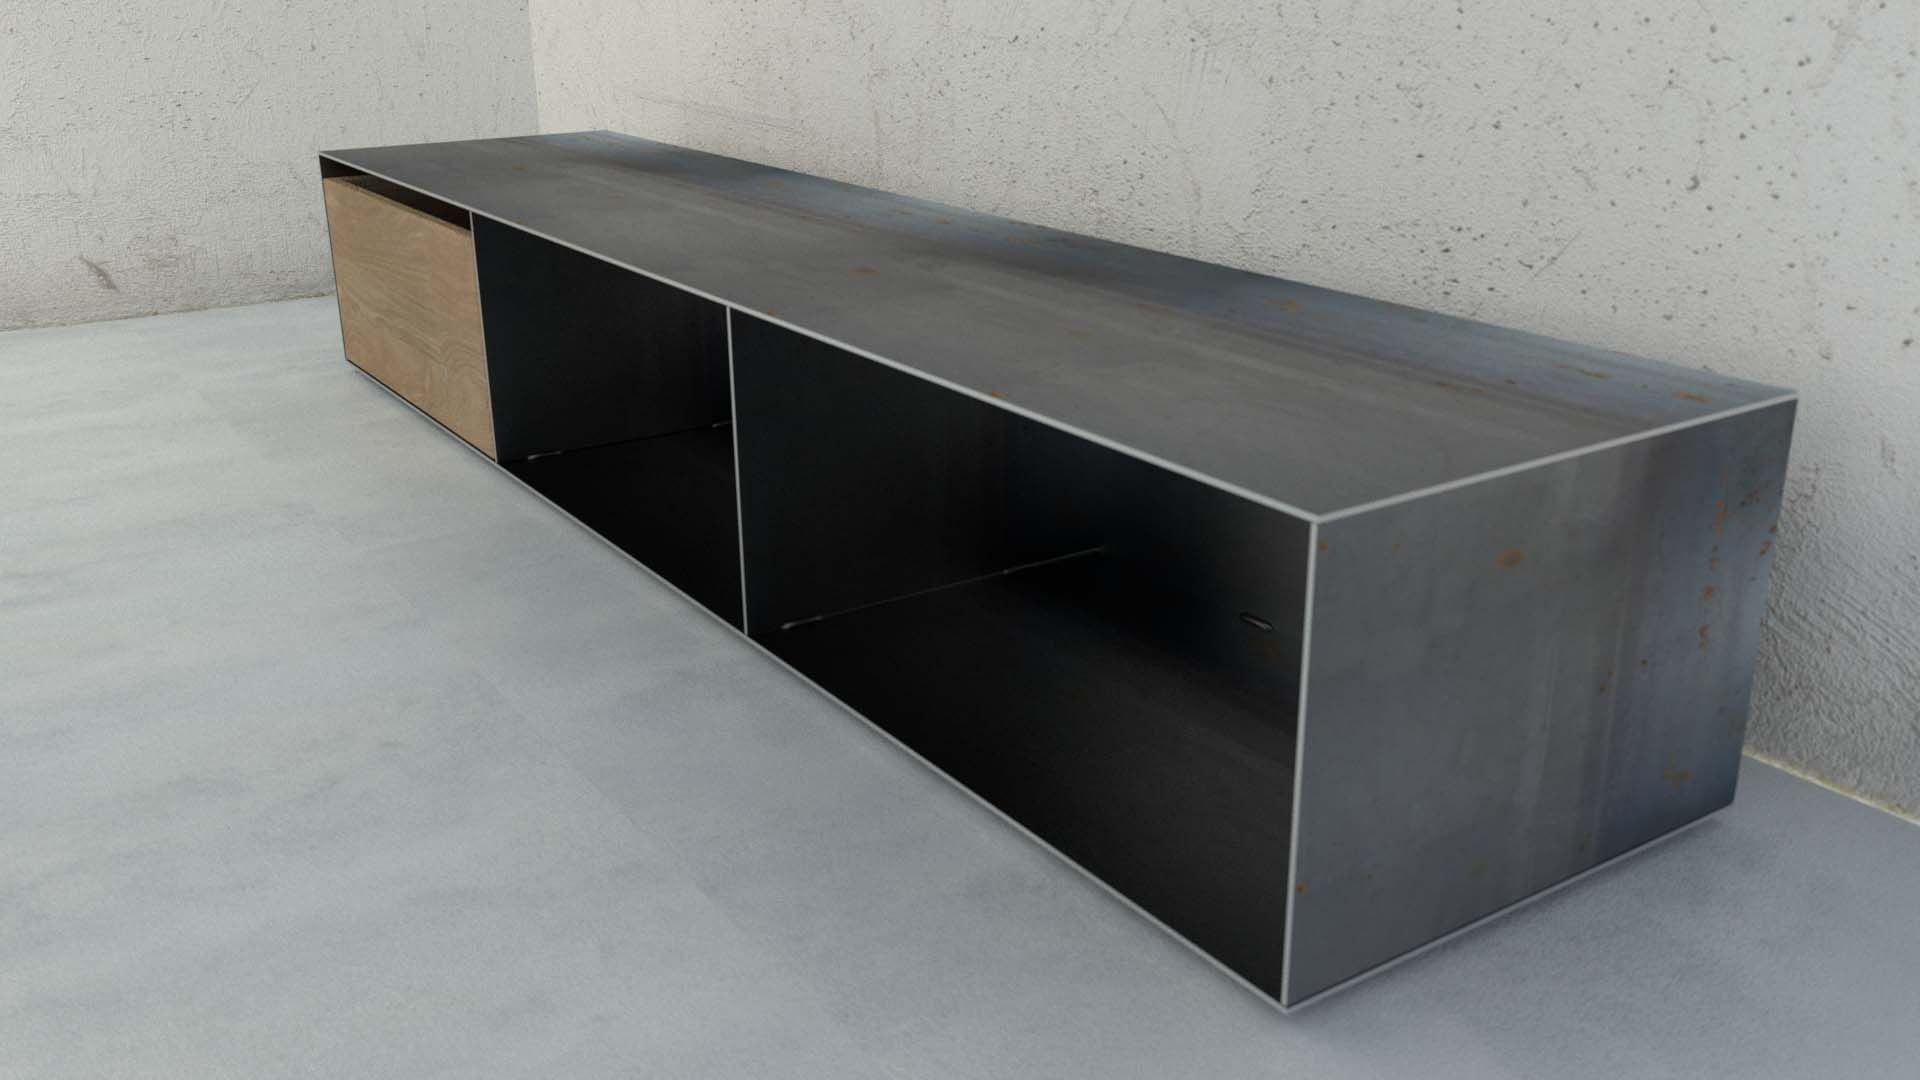 DesignMetallmoebel BrennholzSideboard KaminholzAufbewahrung mit S  Stahlmbel Brennholzregal